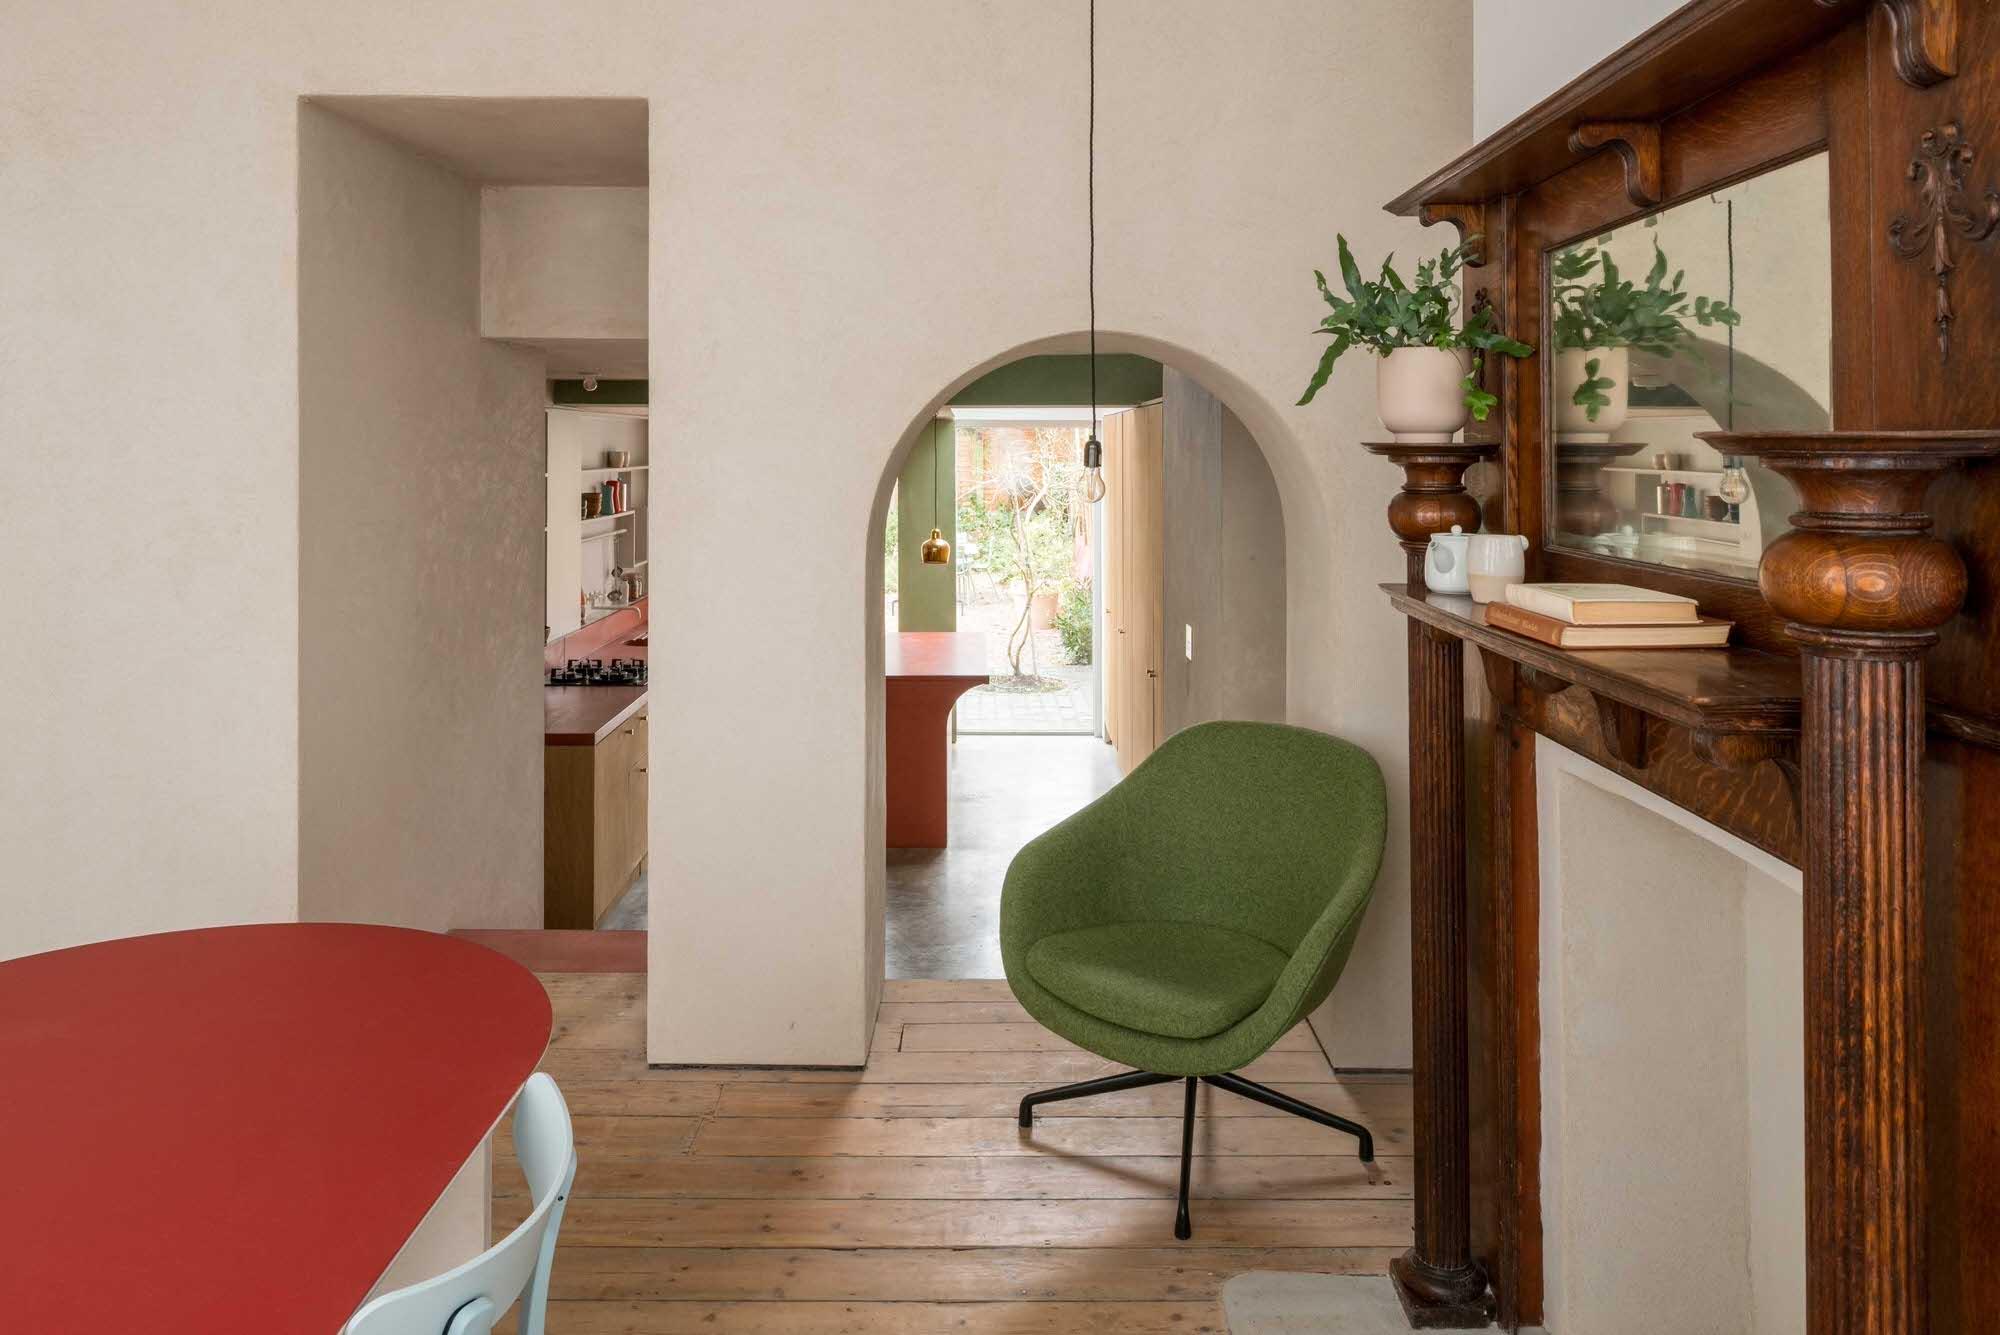 Studio Ben Allen House Recast London Residential Architecture Photo French+tye Yellowtrace 16